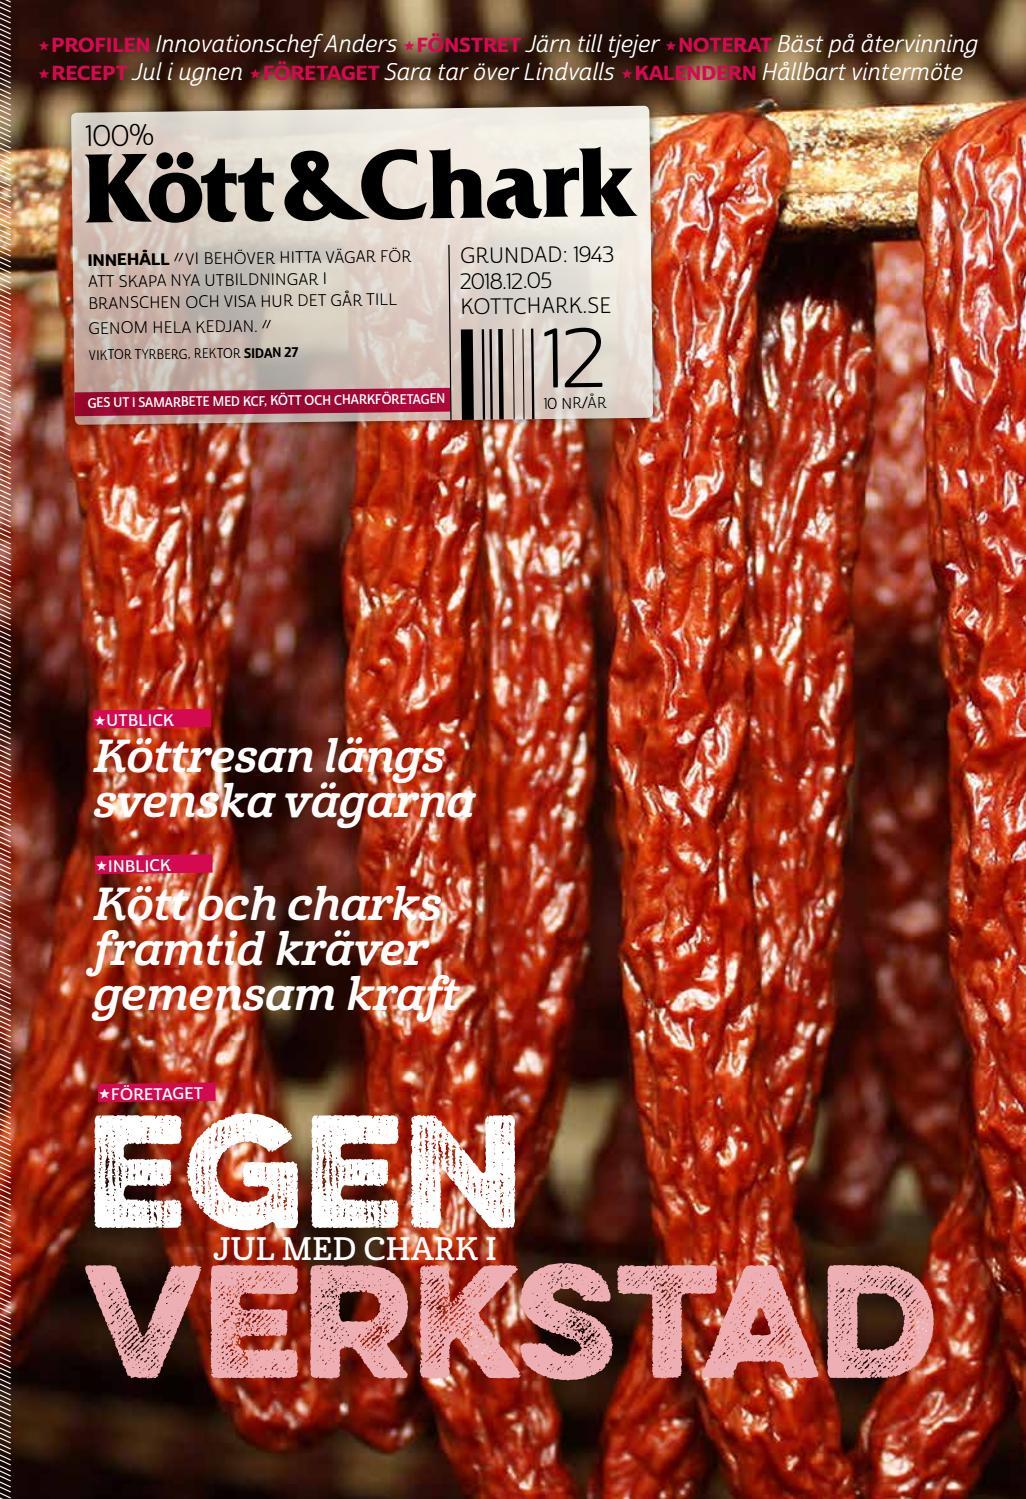 Xnxxcom Escorttjejerknull Kirseberg - Massage Malm